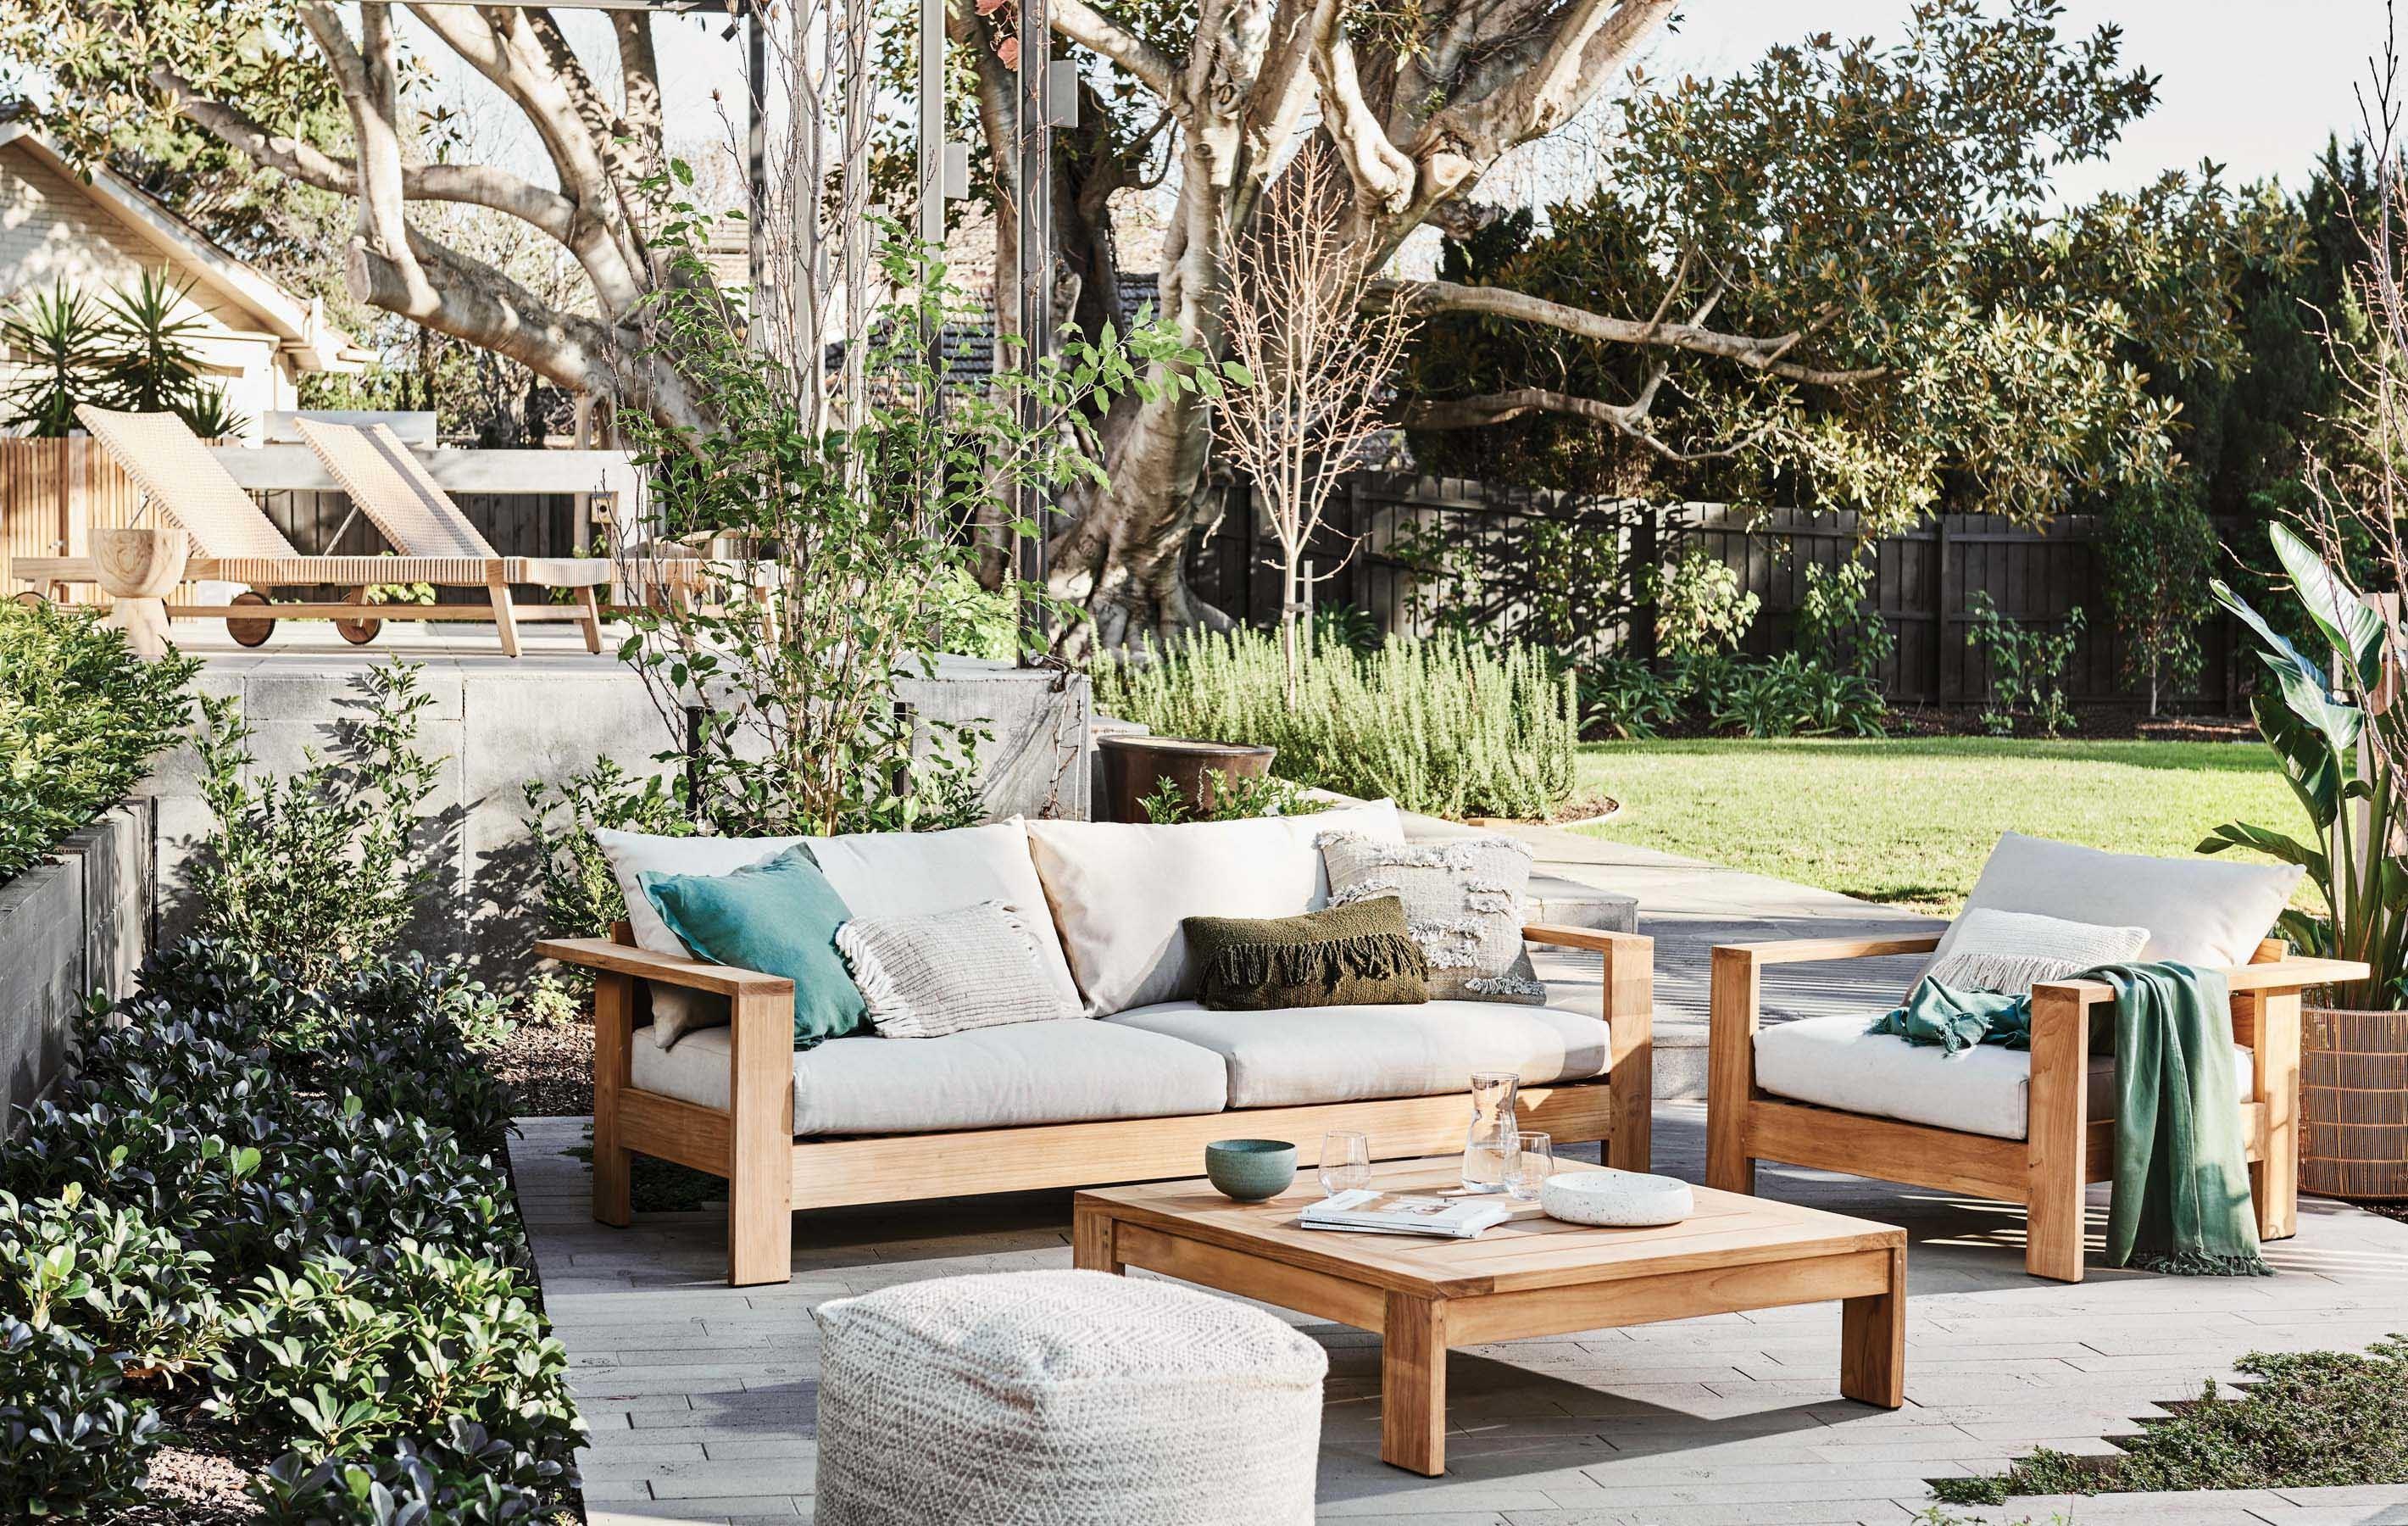 Furniture Gallery Sofas hamptons-three-seater-sofa